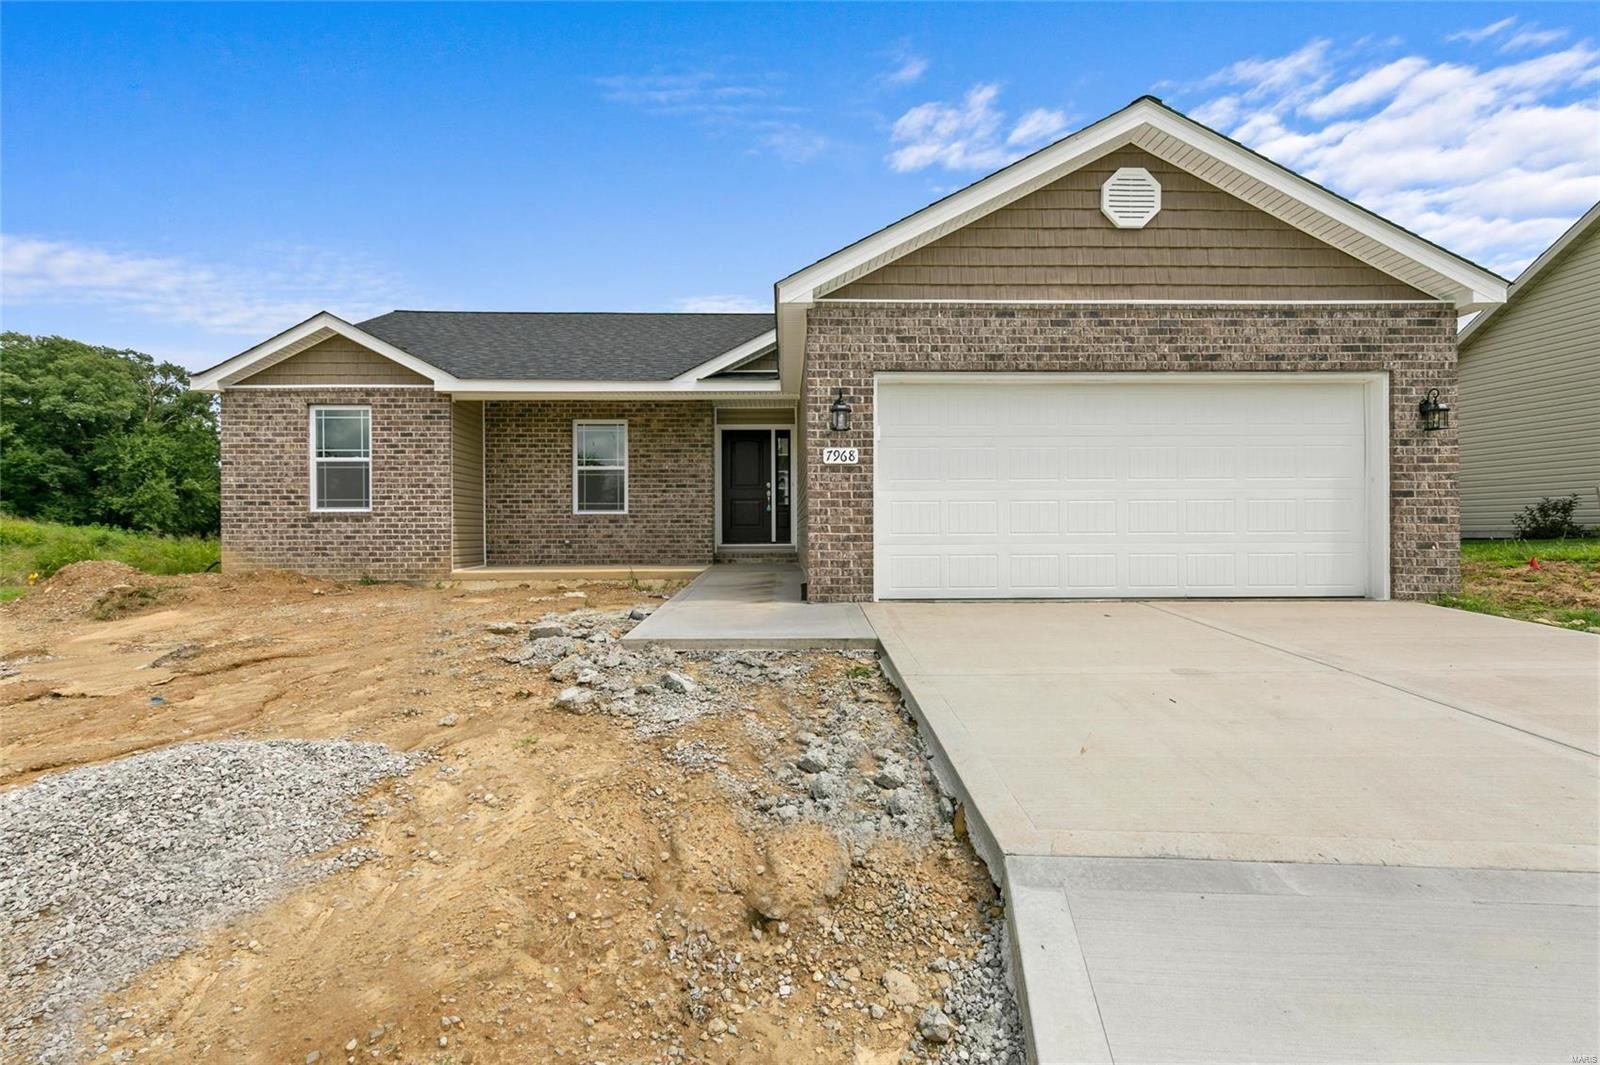 7968 Laurel Flats Drive, Caseyville, IL 62232 - MLS#: 20043962